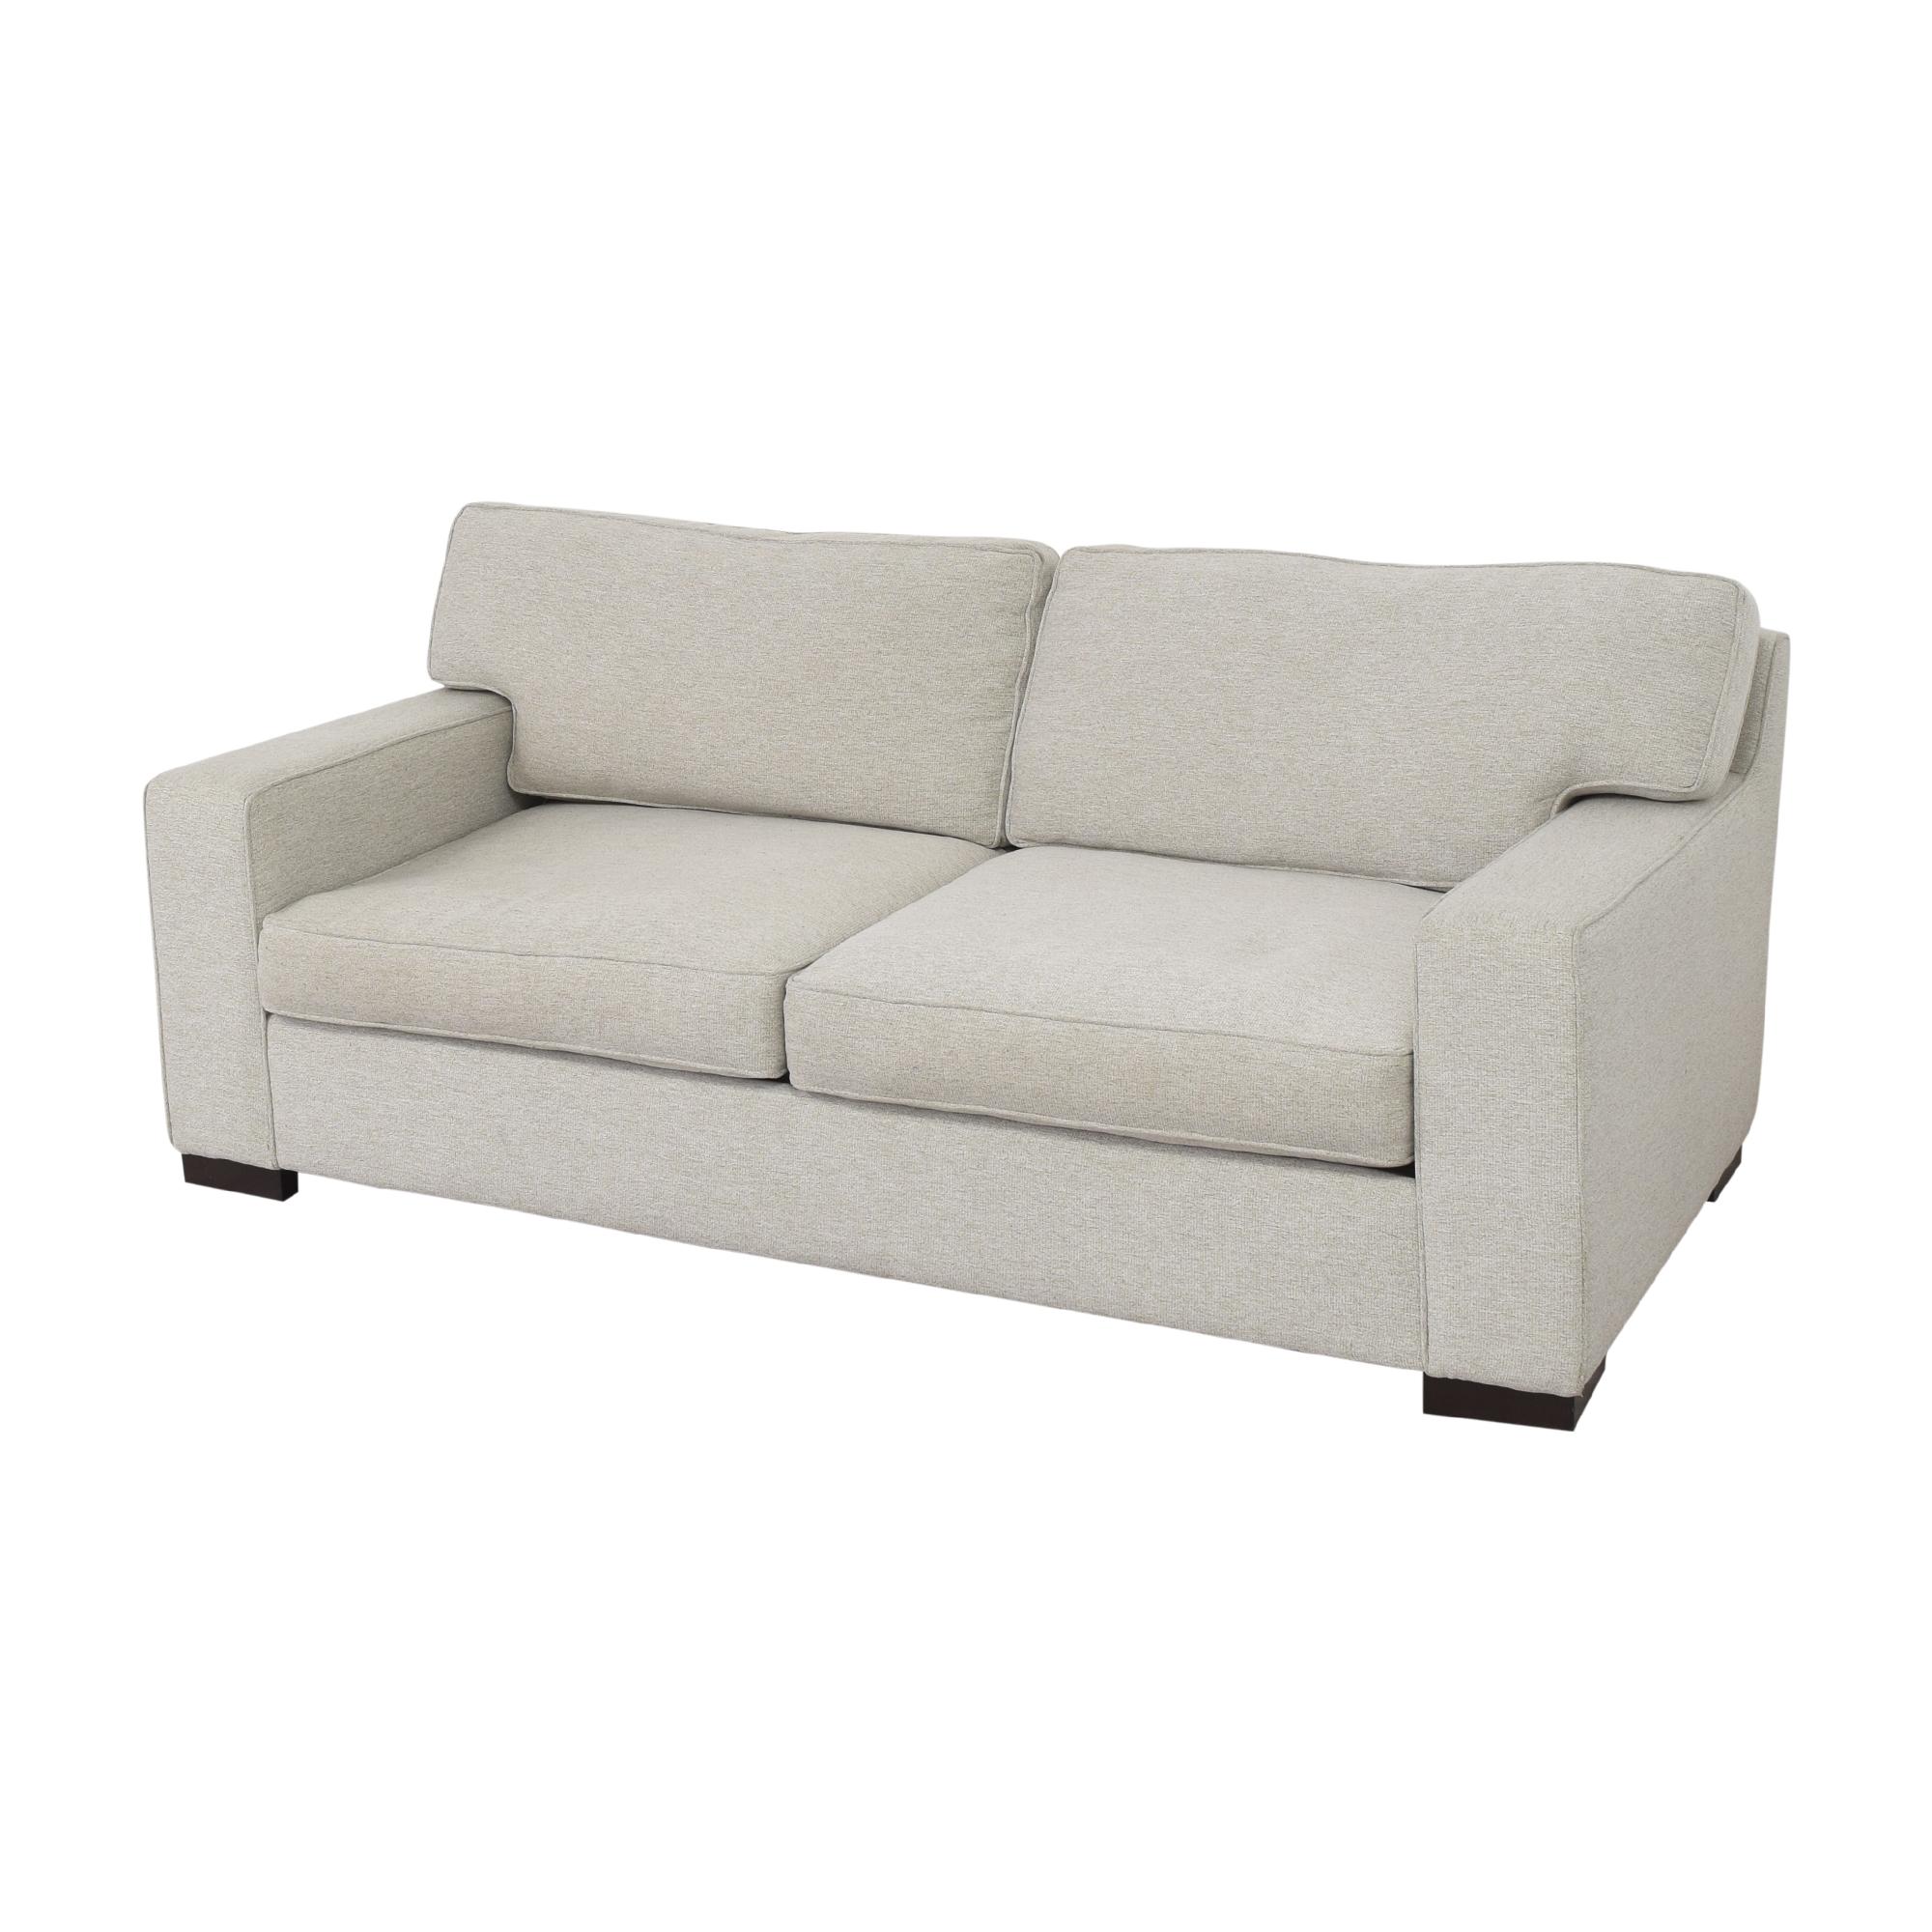 shop Max Home Wellesley Two Cushion Sofa Max Home